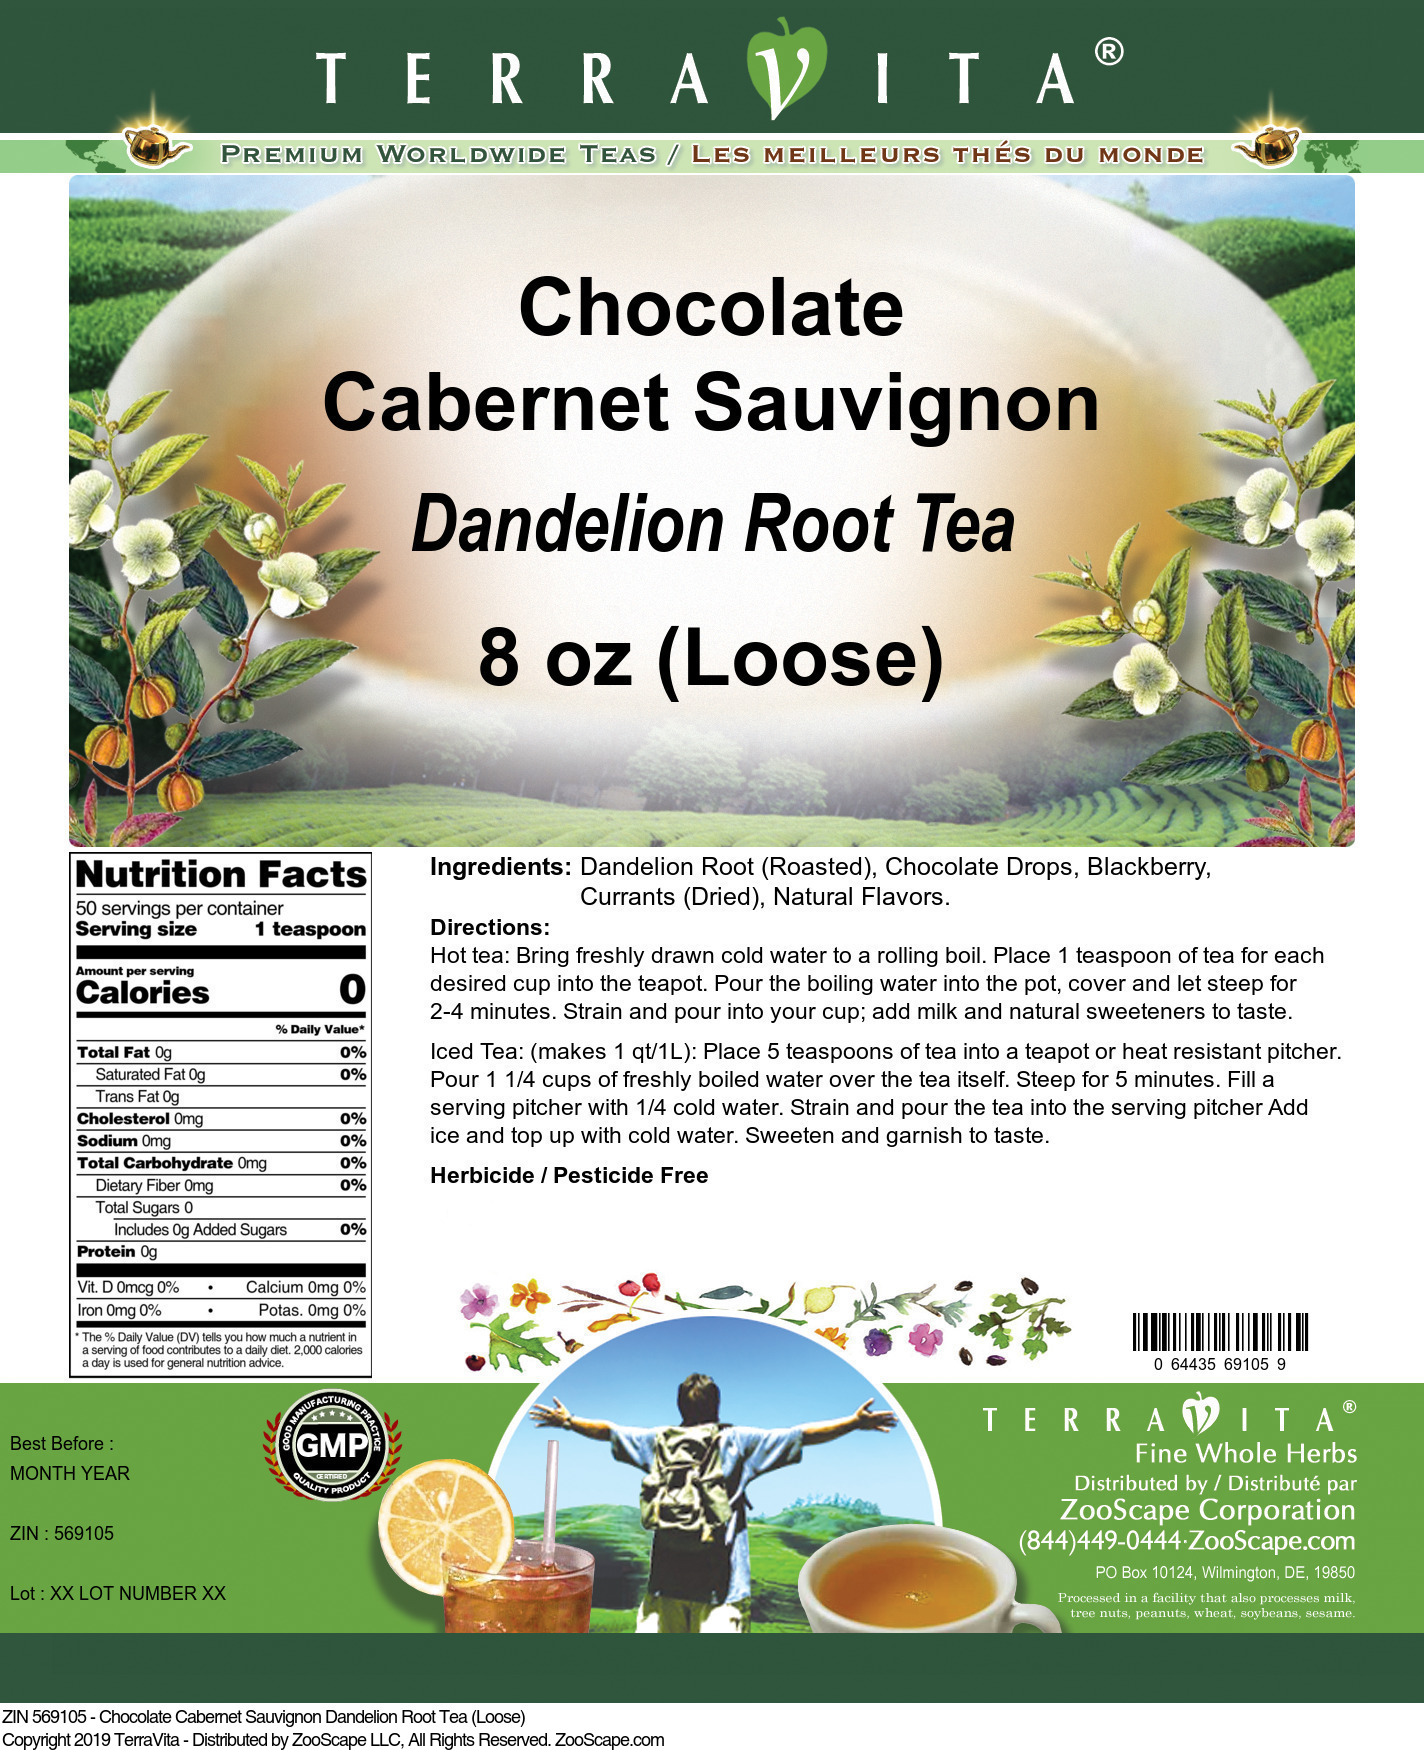 Chocolate Cabernet Sauvignon Dandelion Root